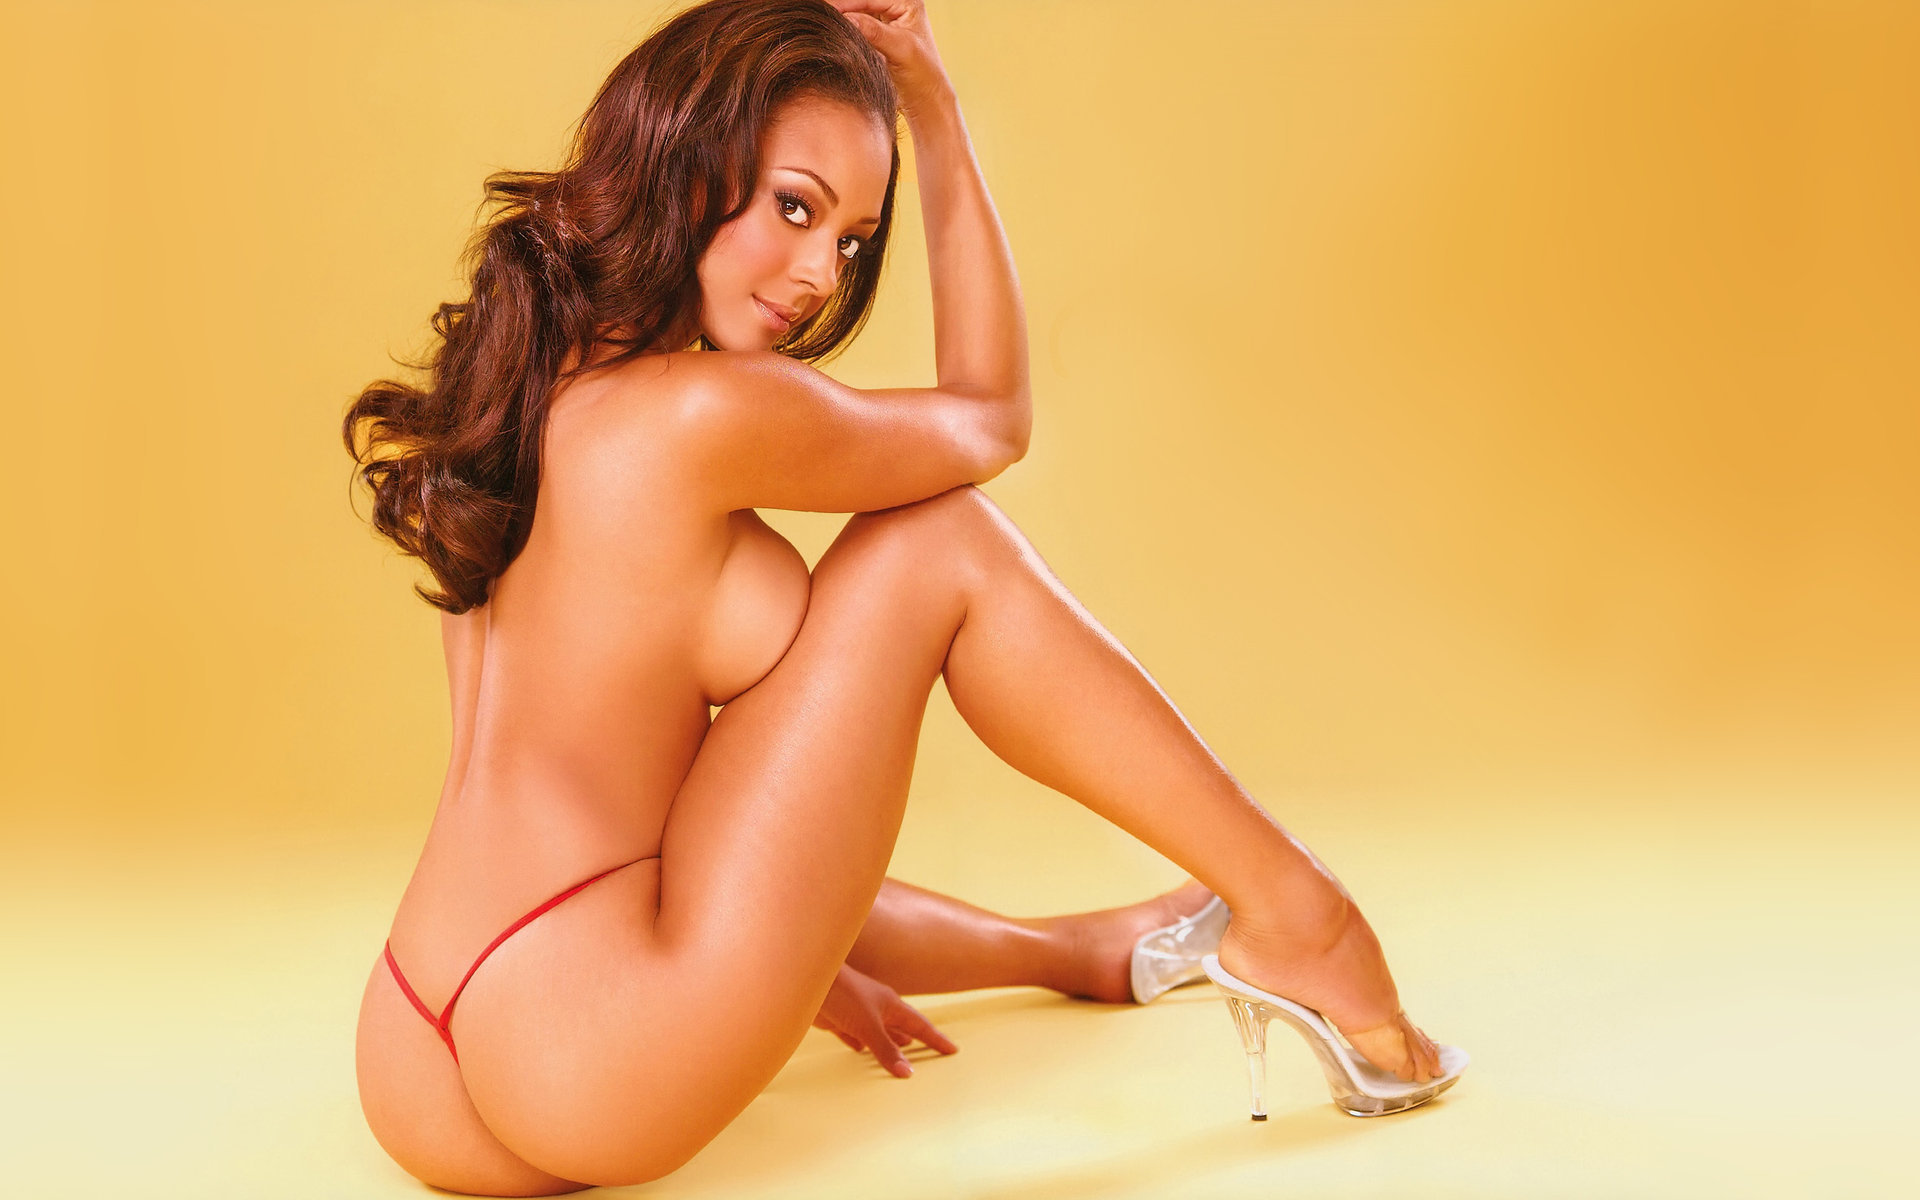 Darlene curtis nude wallpaper